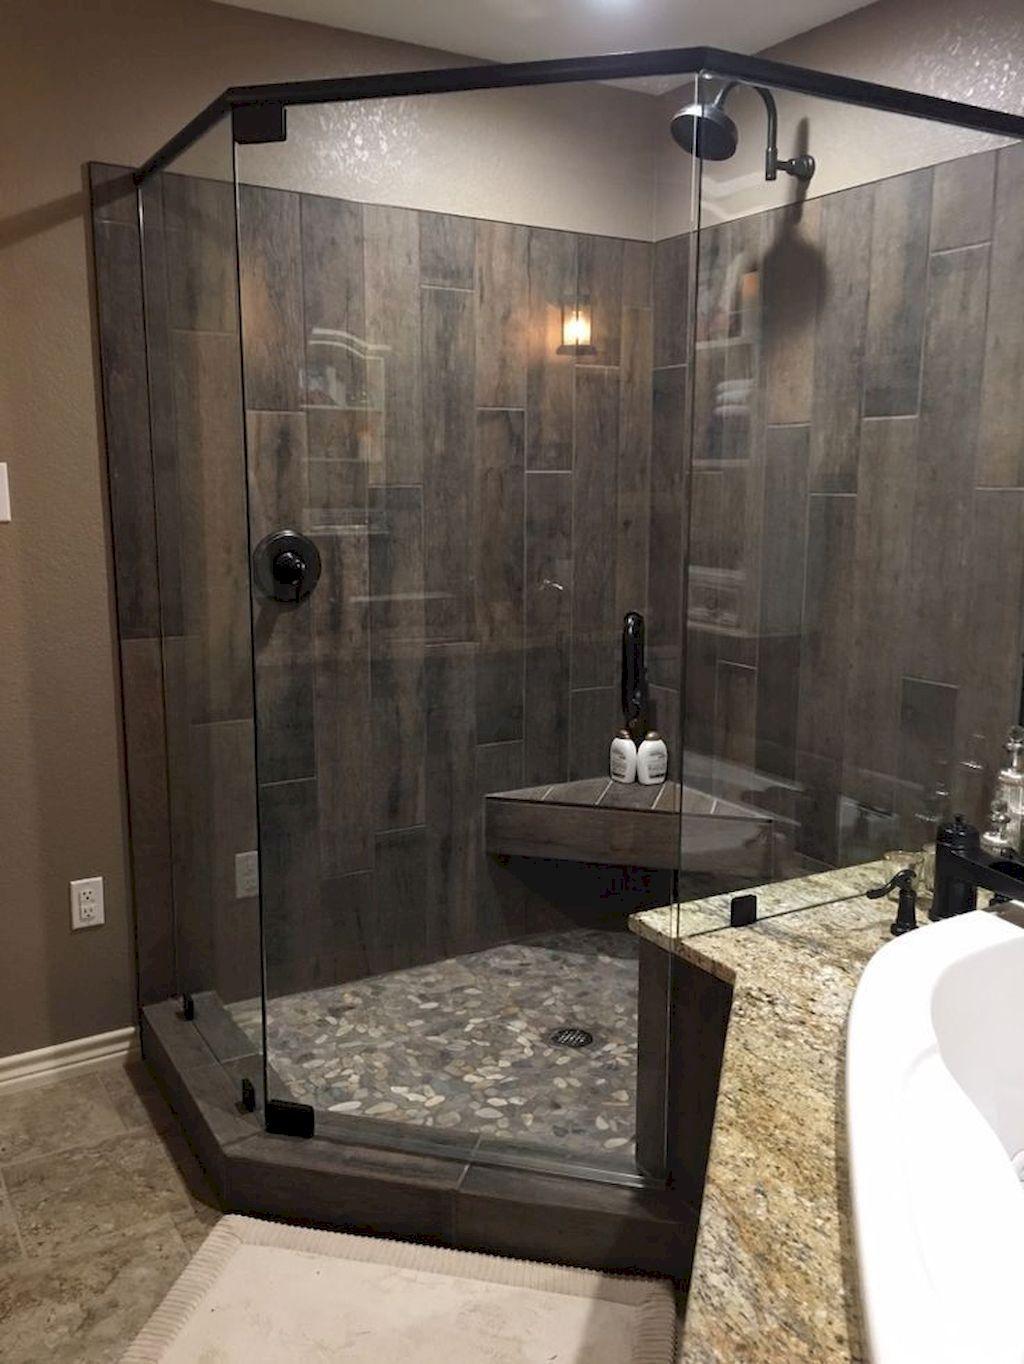 90 Insane Rustic Farmhouse Shower Tile Remodel Ideas - DoitDecor